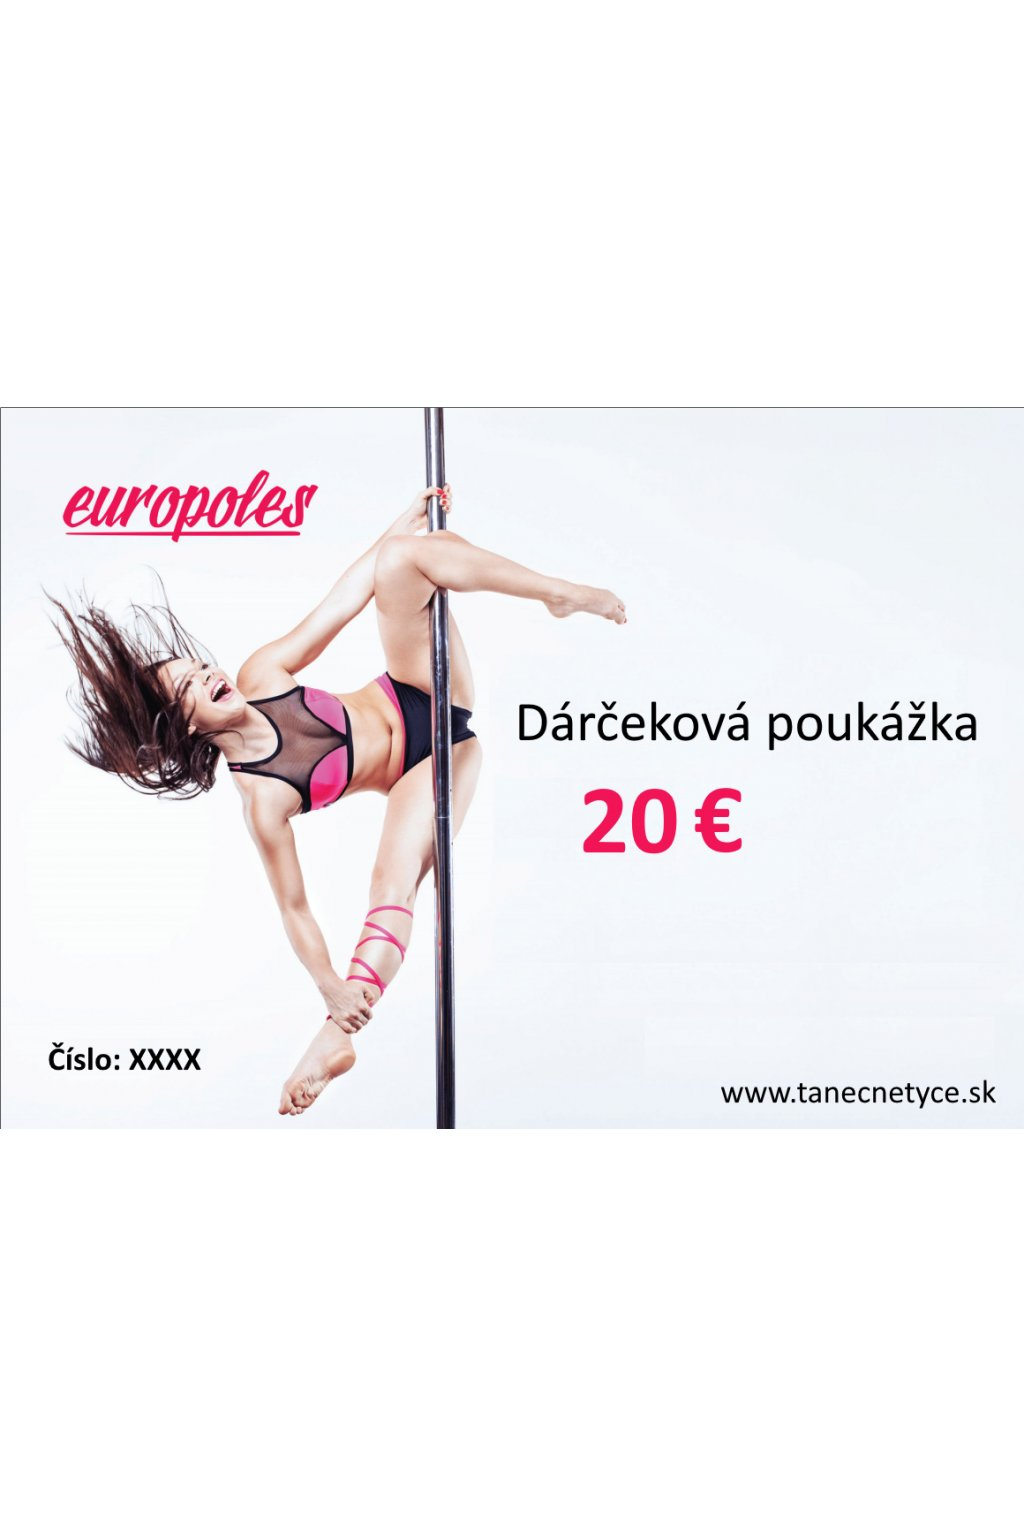 poukazka 20 eur